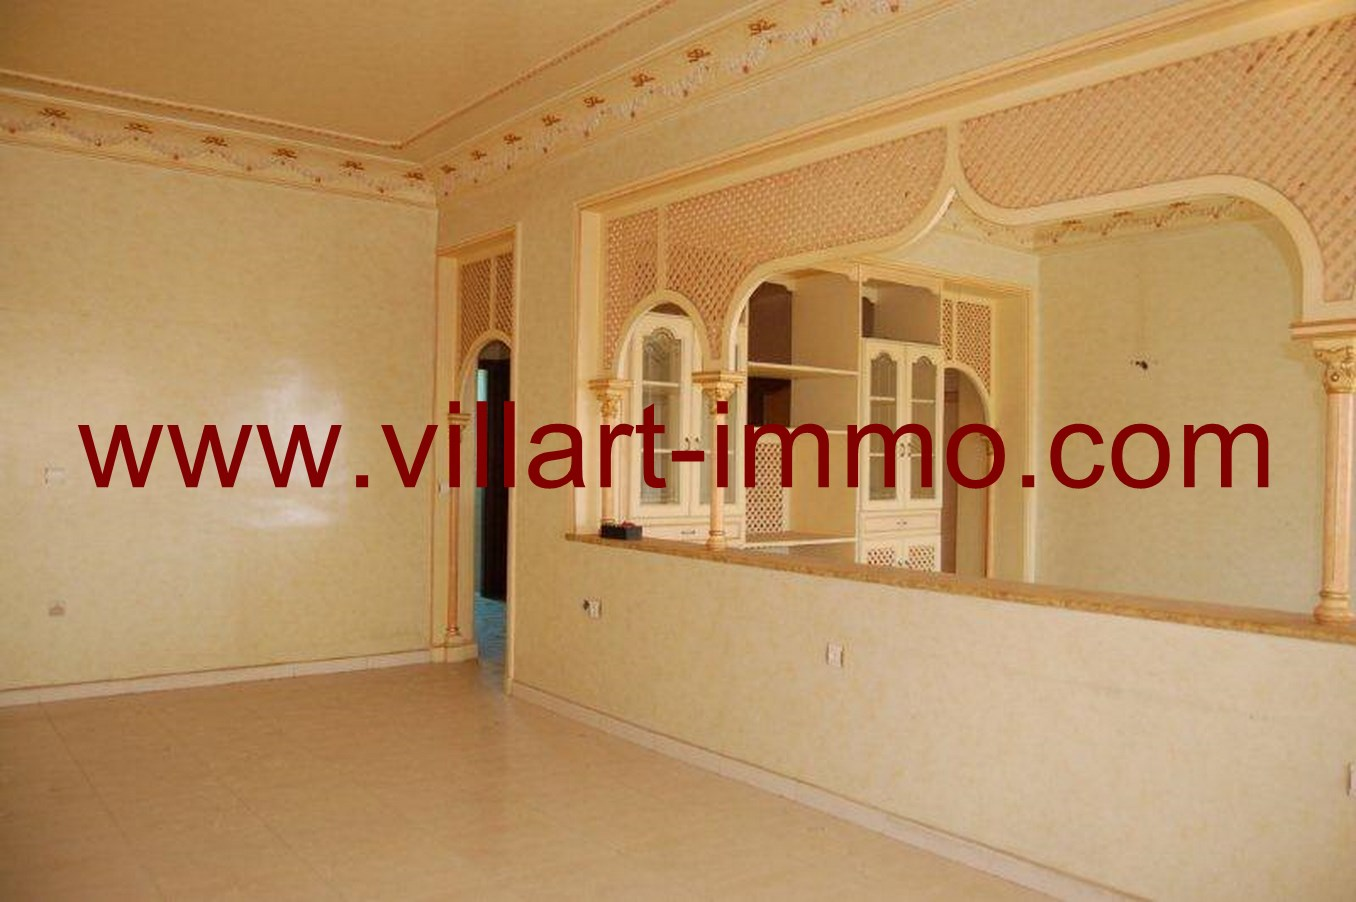 1-Location-Appartement-Non meublé-Tanger-Salon-L662-Villart immo